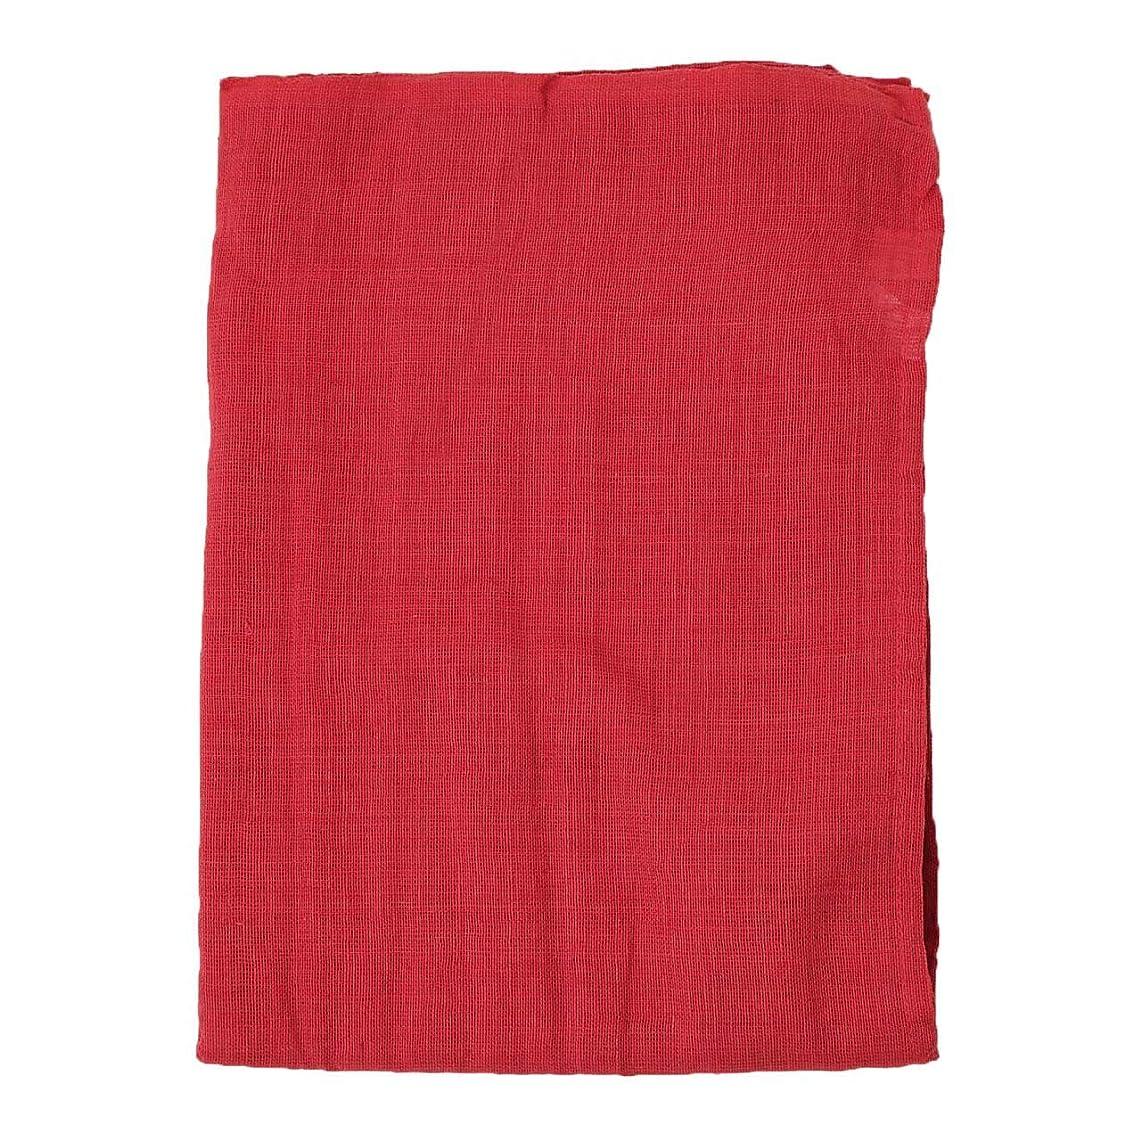 【180cm×270cm】 NEW エタワ織 マルチカバー マルチクロス ソファーカバー ベッドカバー (レッド)